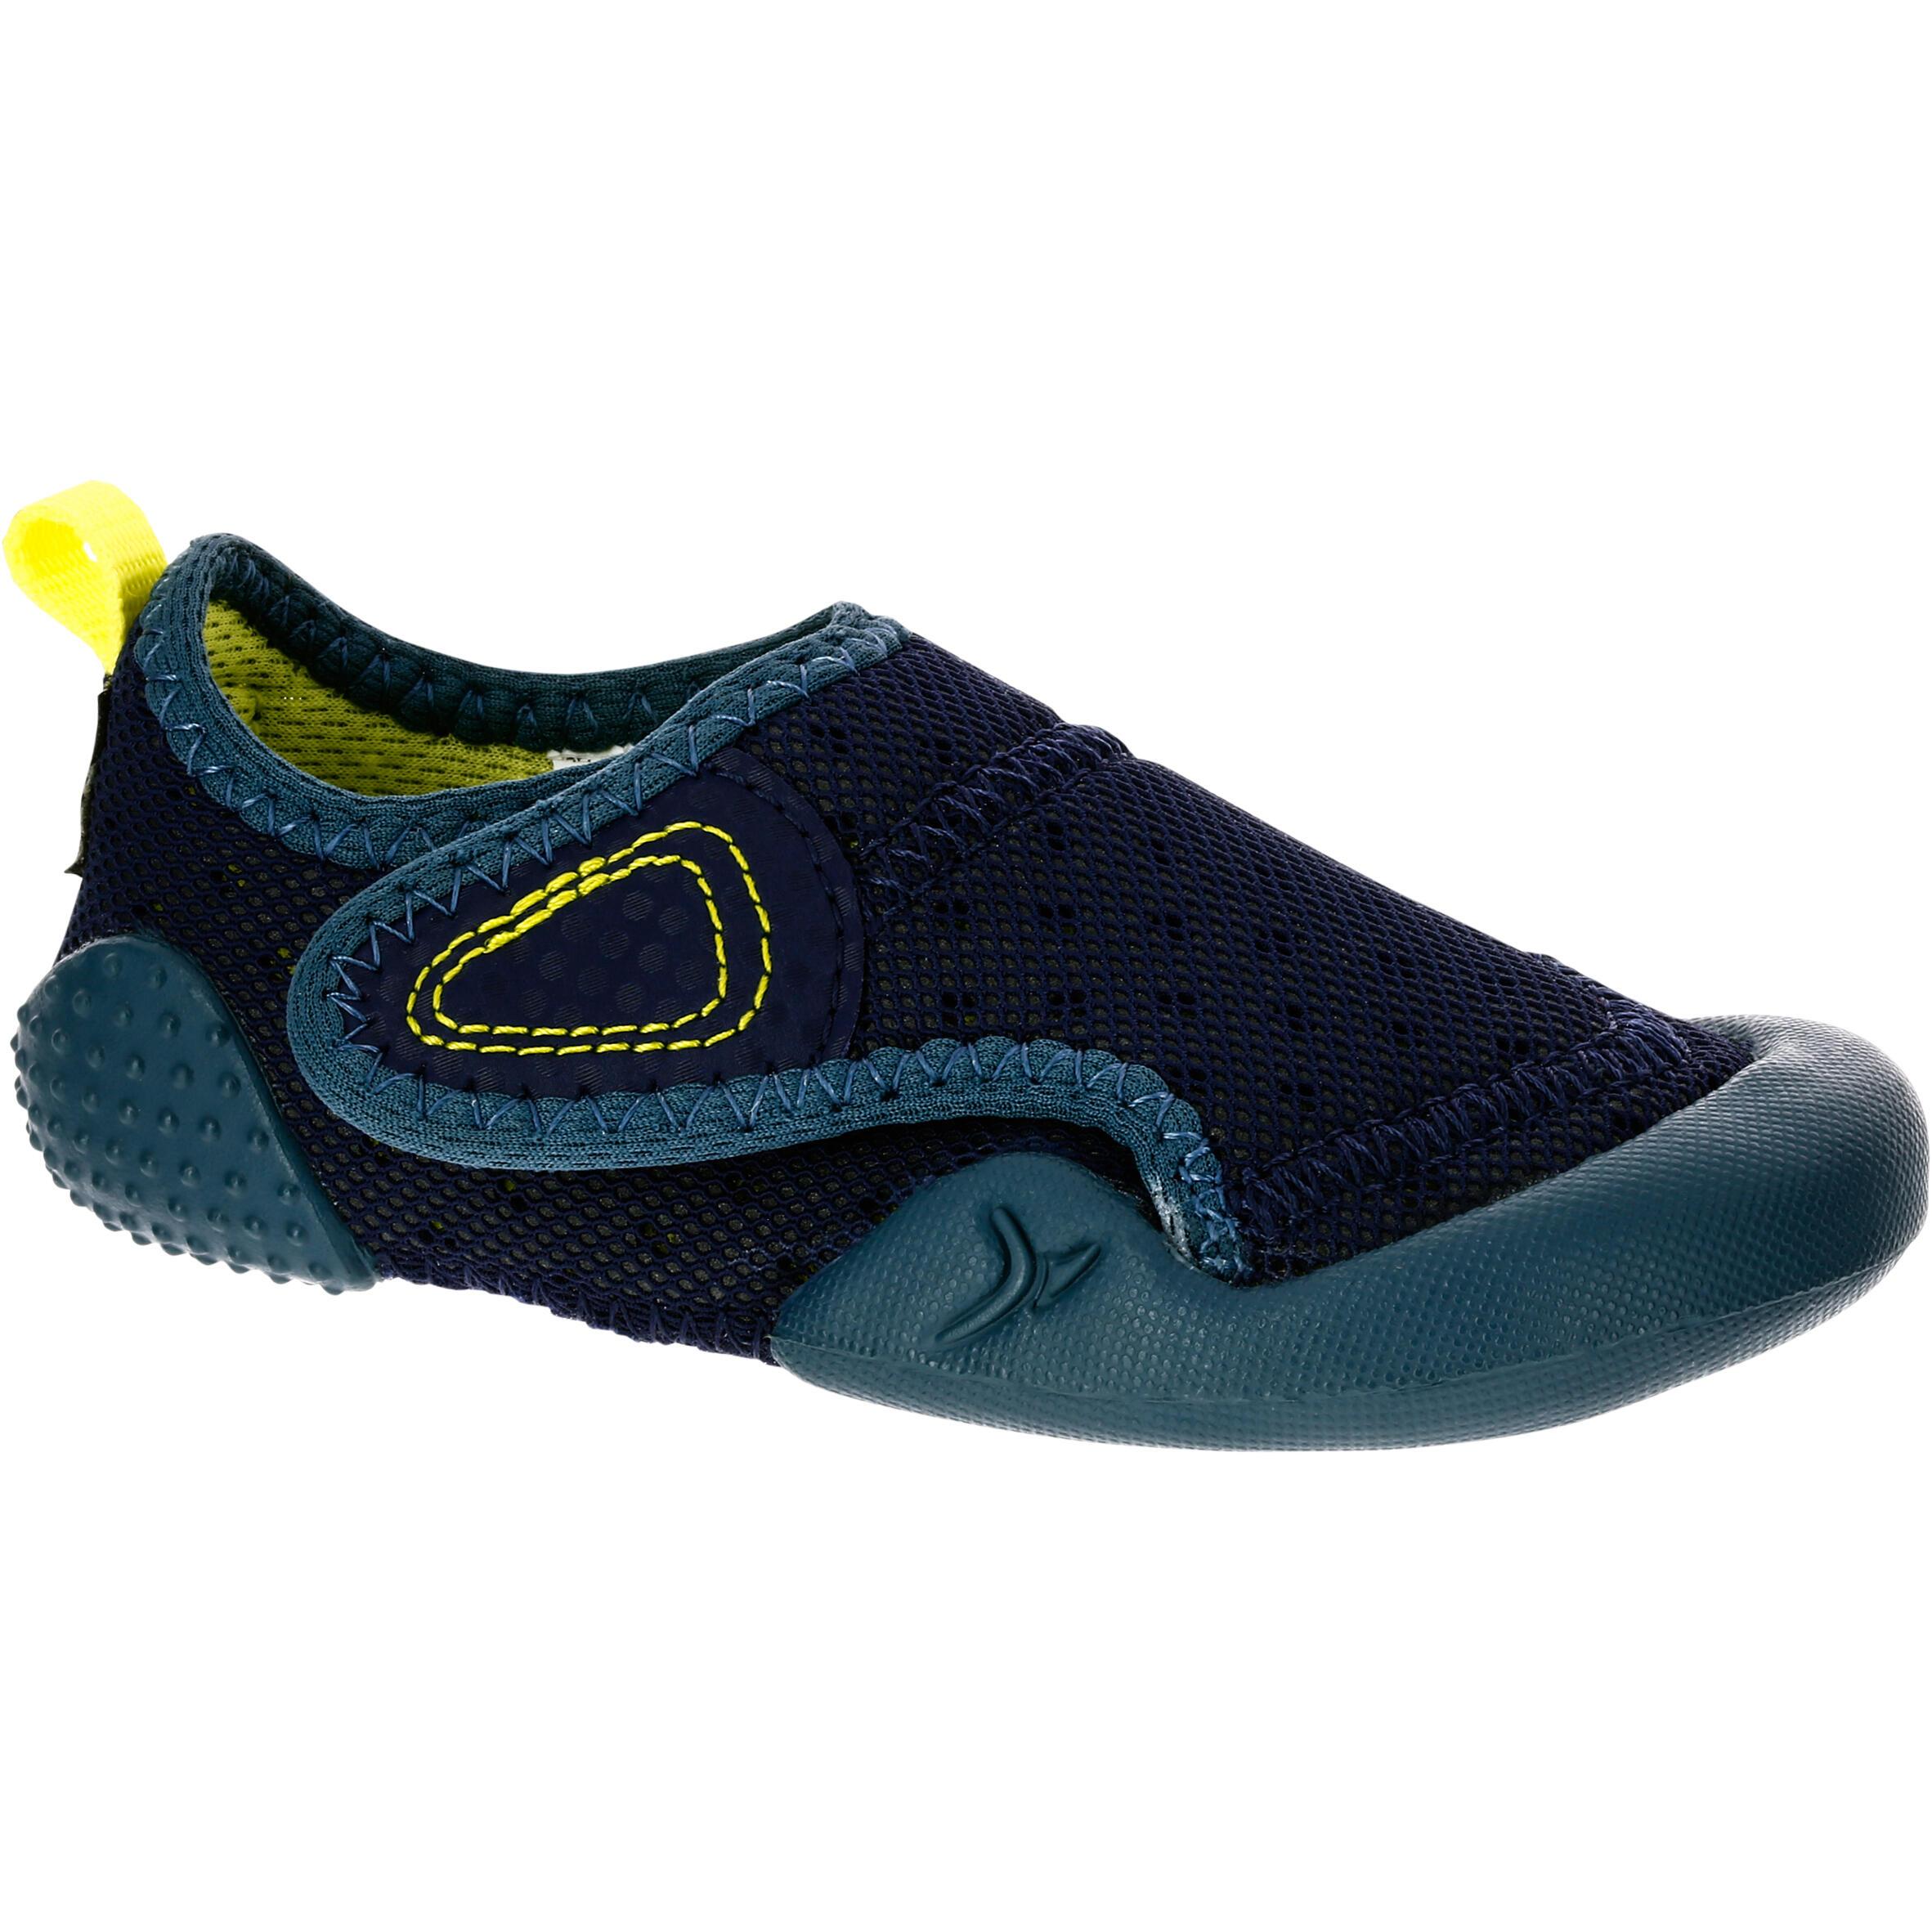 Baby,Kinder,Jungen,Kinder Turnschuhe Babylight 500 marineblau/dunkelgrau | 03608419240054